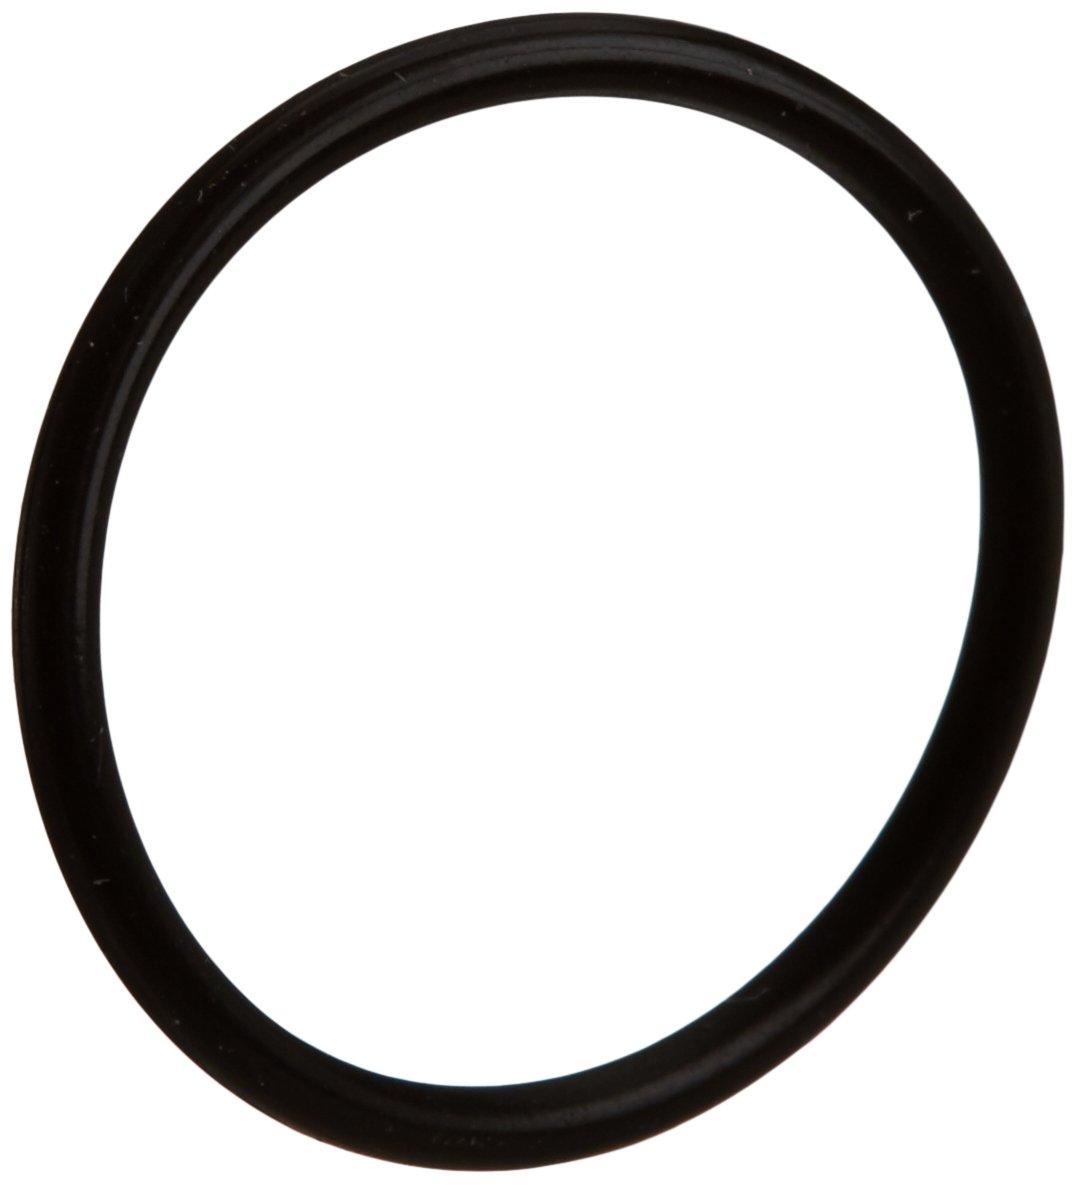 5/St/ück 11.1915.037.000 Zipp O-Ring Kugellager Shield Vorne oder Hinten 88//188/Hubs